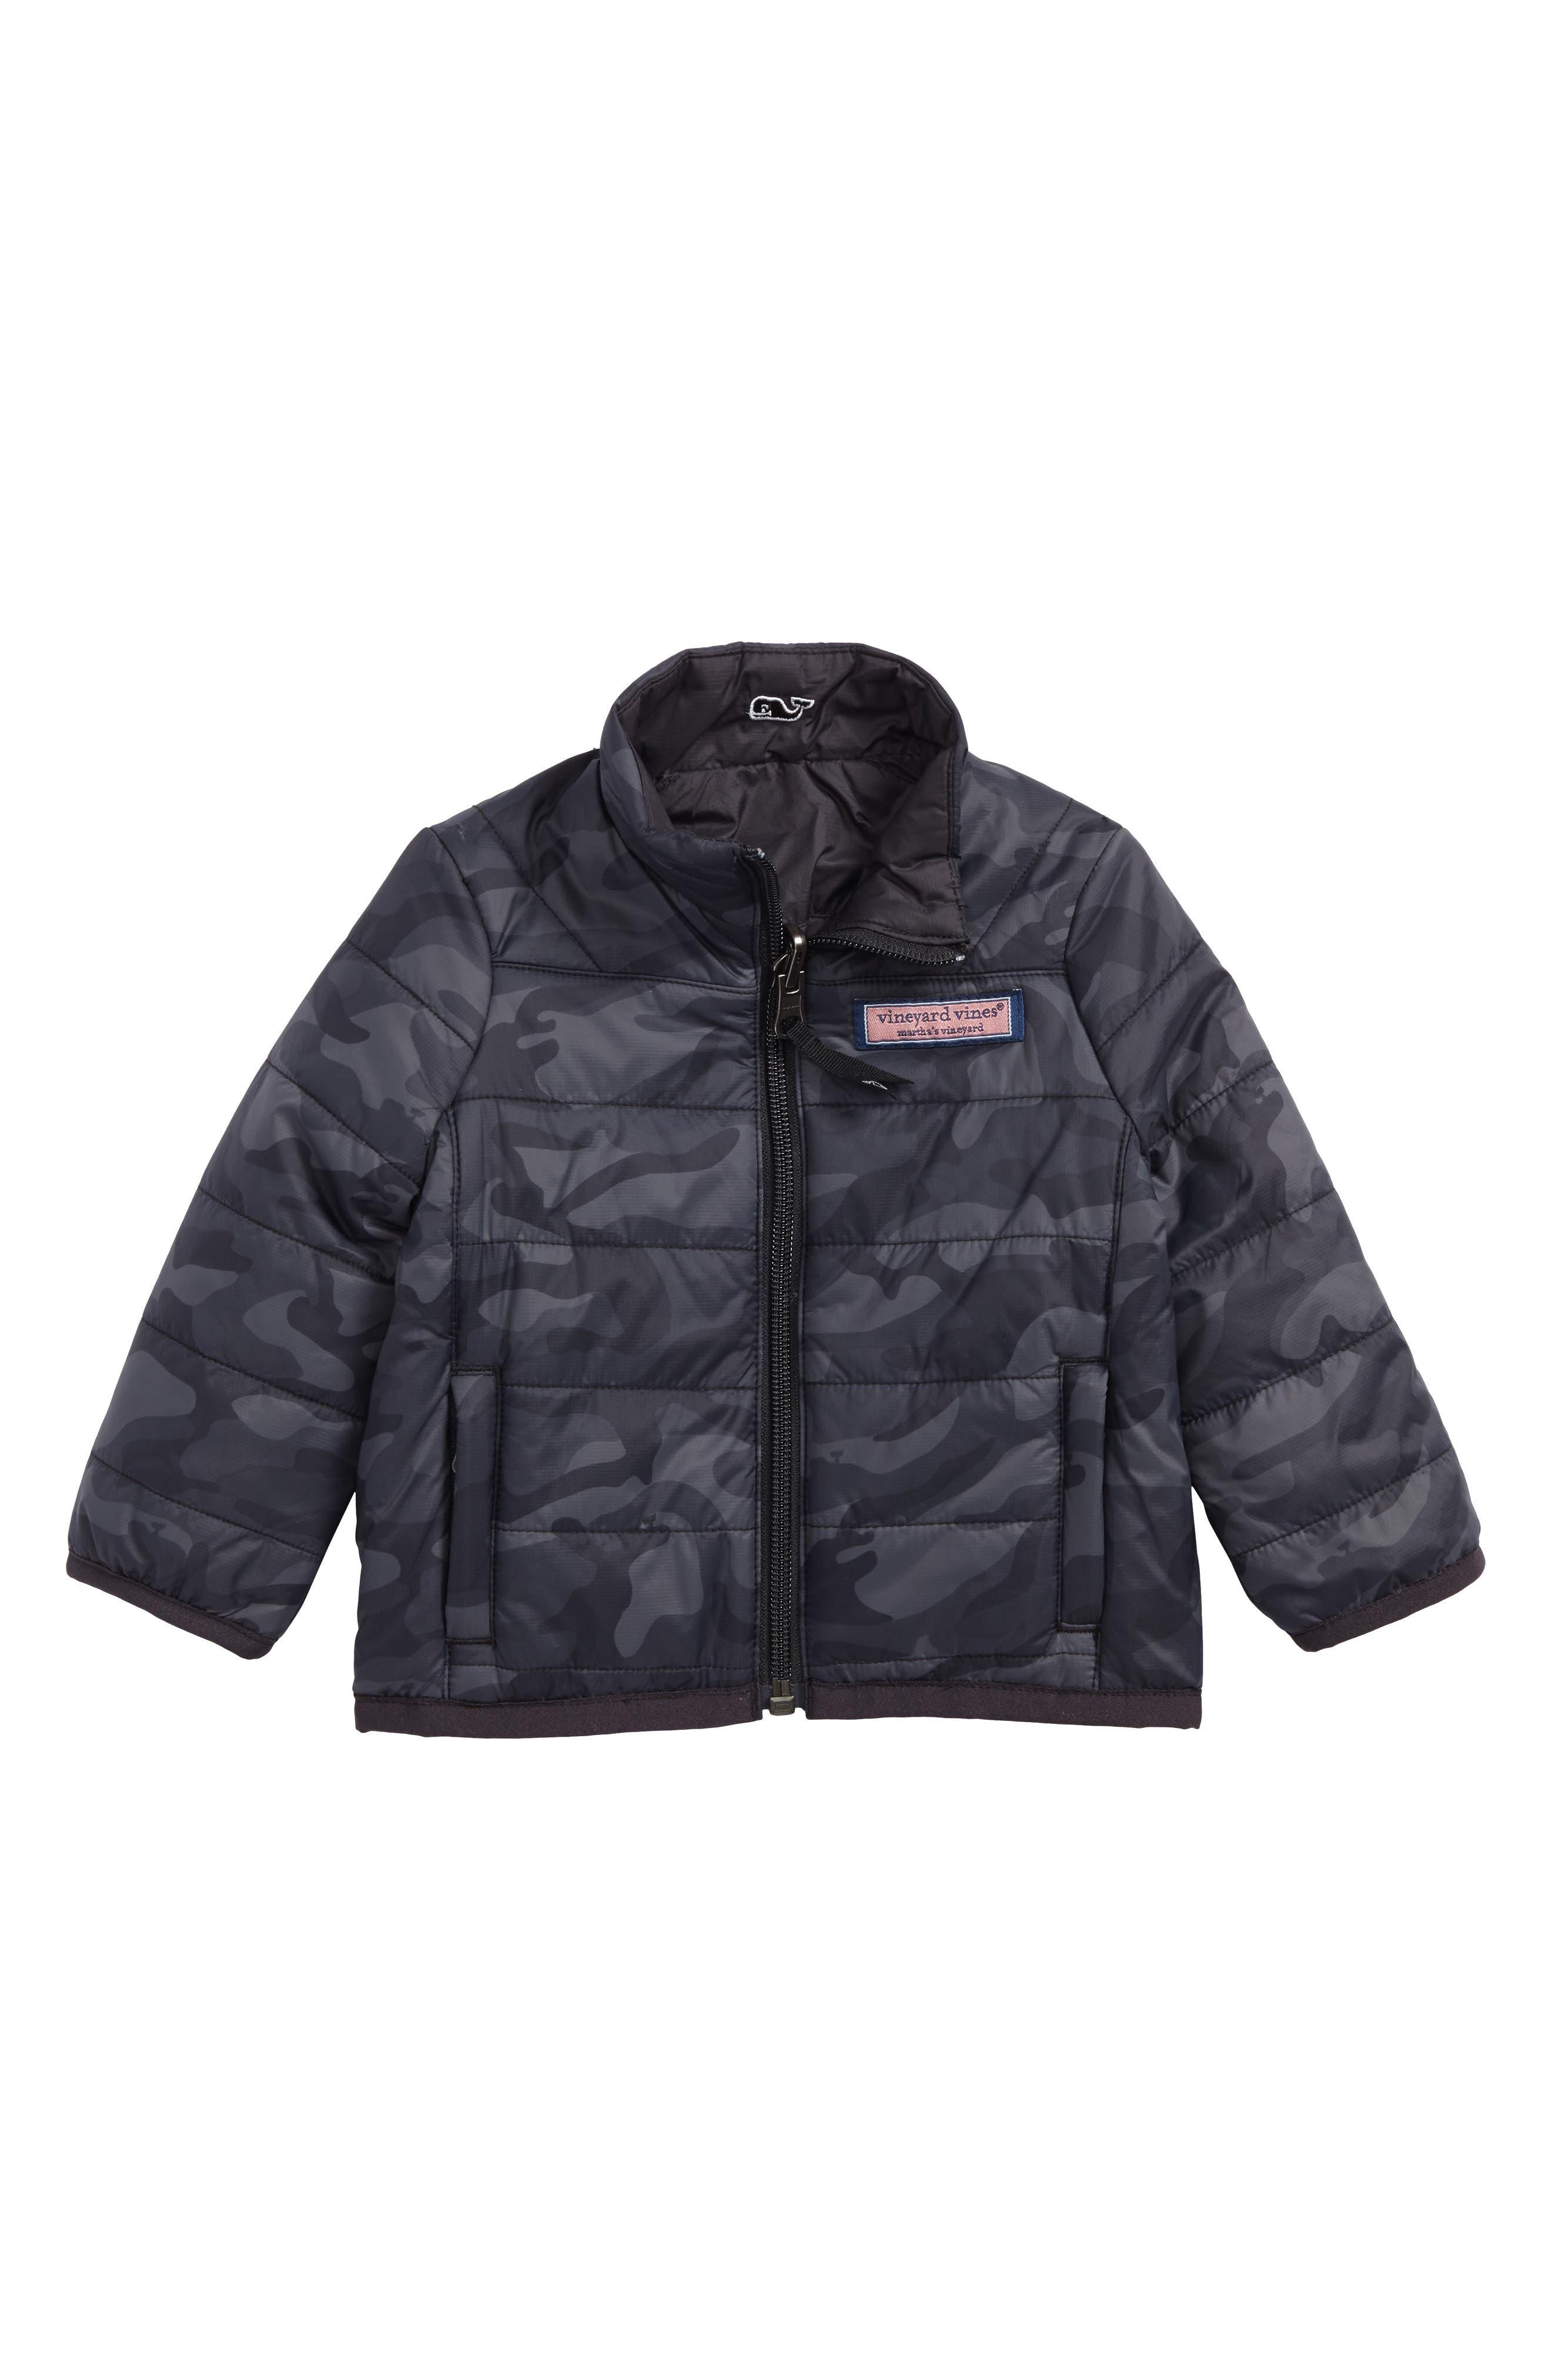 Reversible Mountain Weekend Jacket,                             Main thumbnail 1, color,                             Jet Black